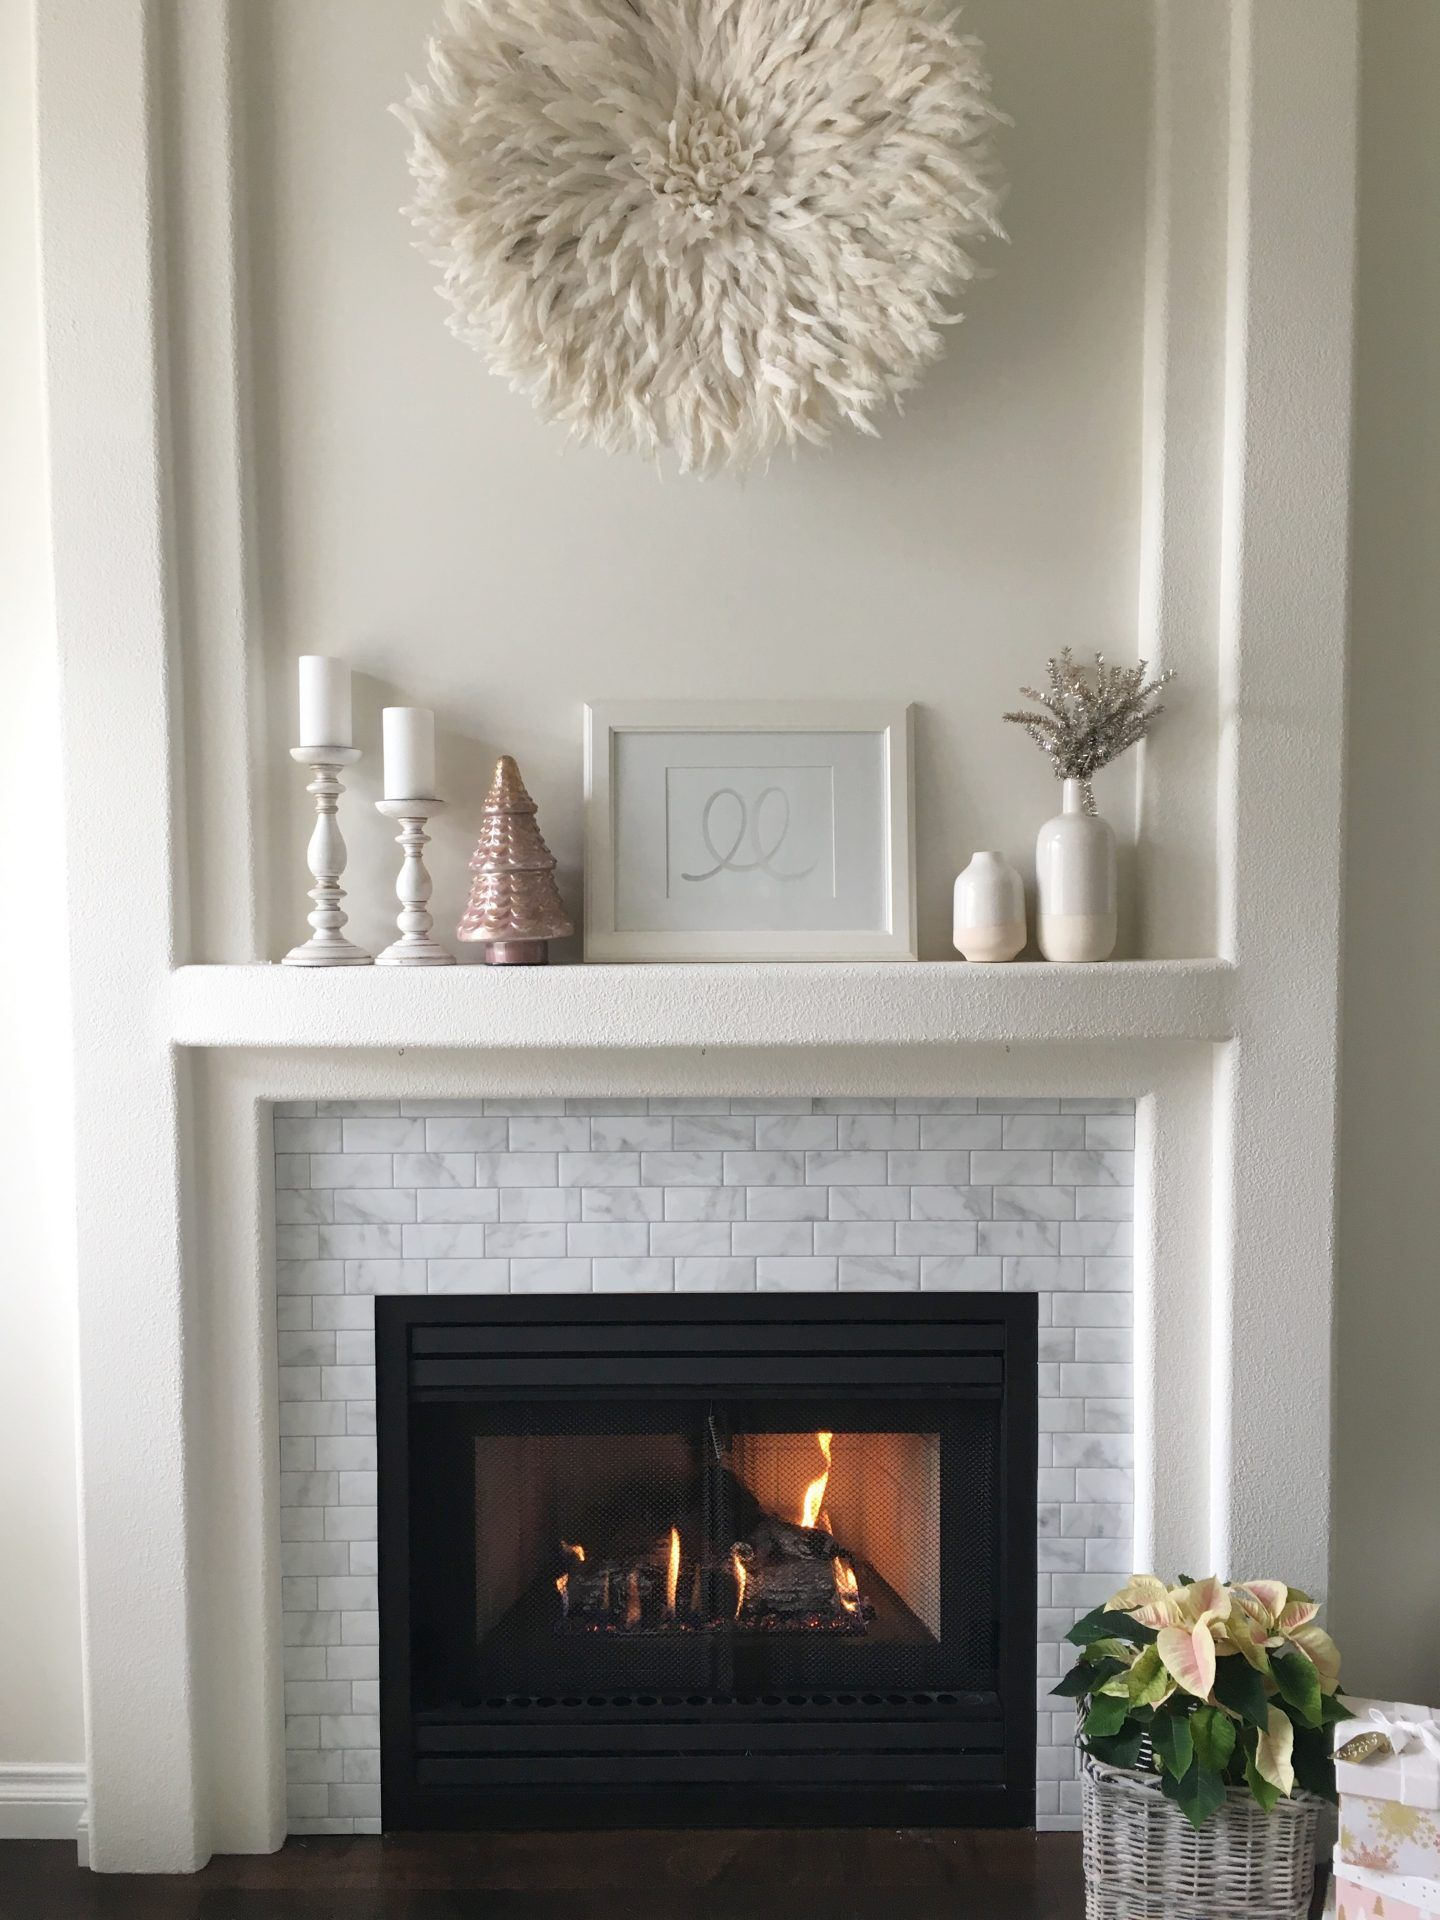 Smart Tiles DIY Fireplace Makeover Home fireplace, Smart